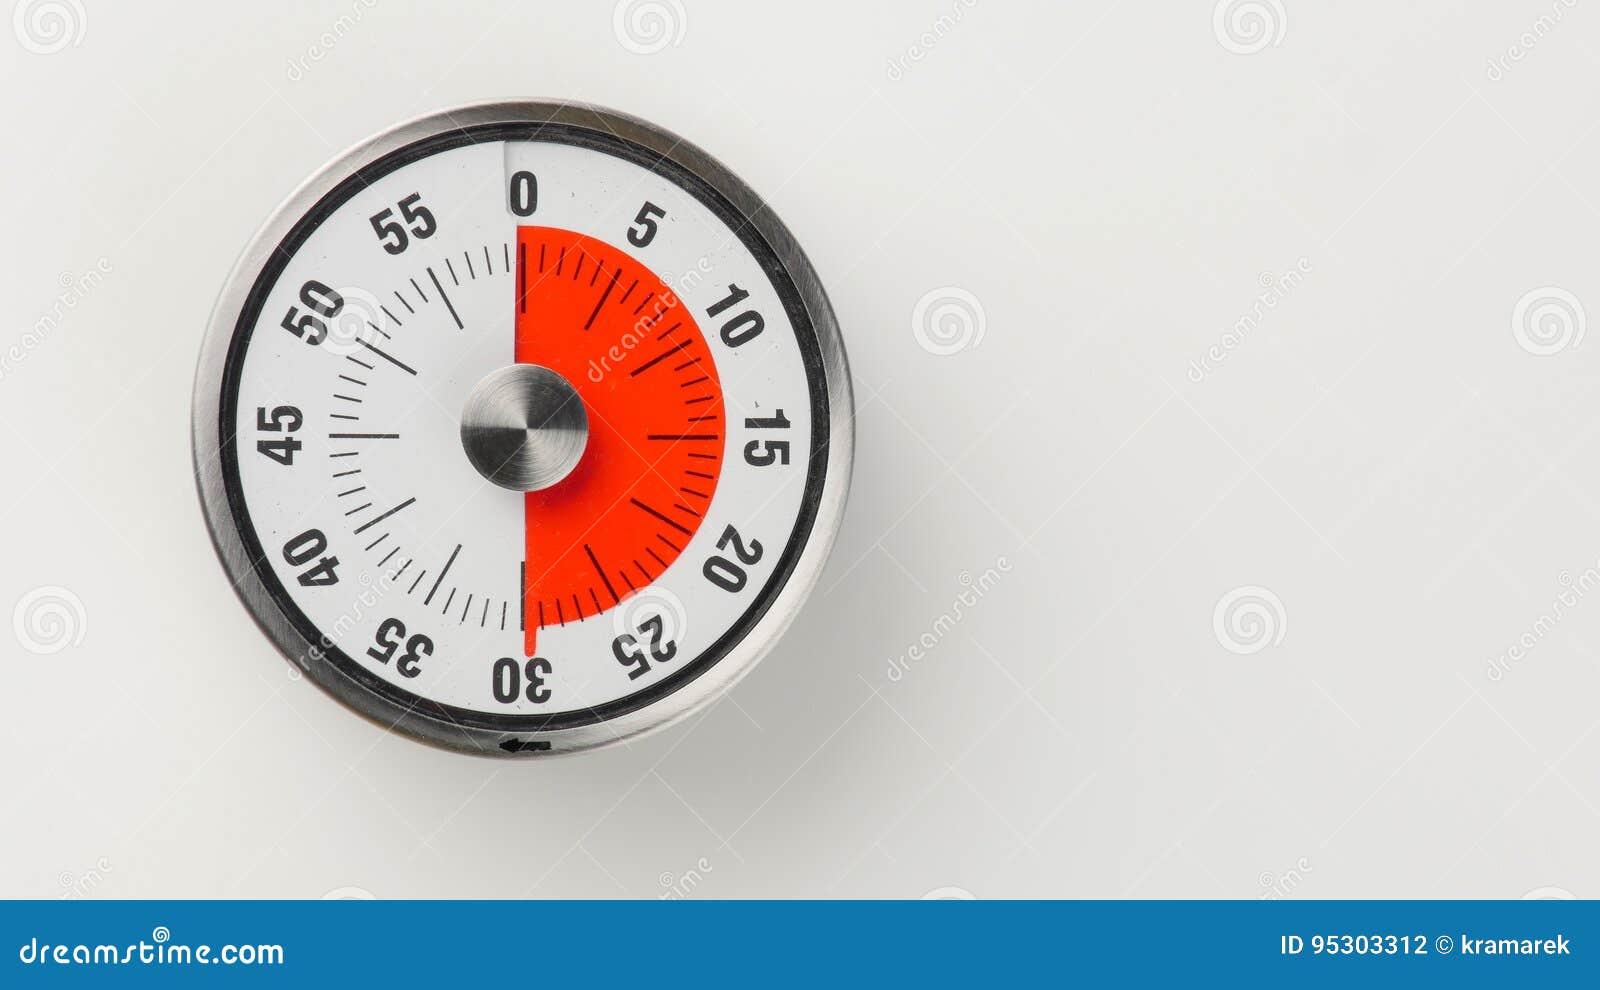 vintage analog kitchen countdown timer 30 minutes remaining stock